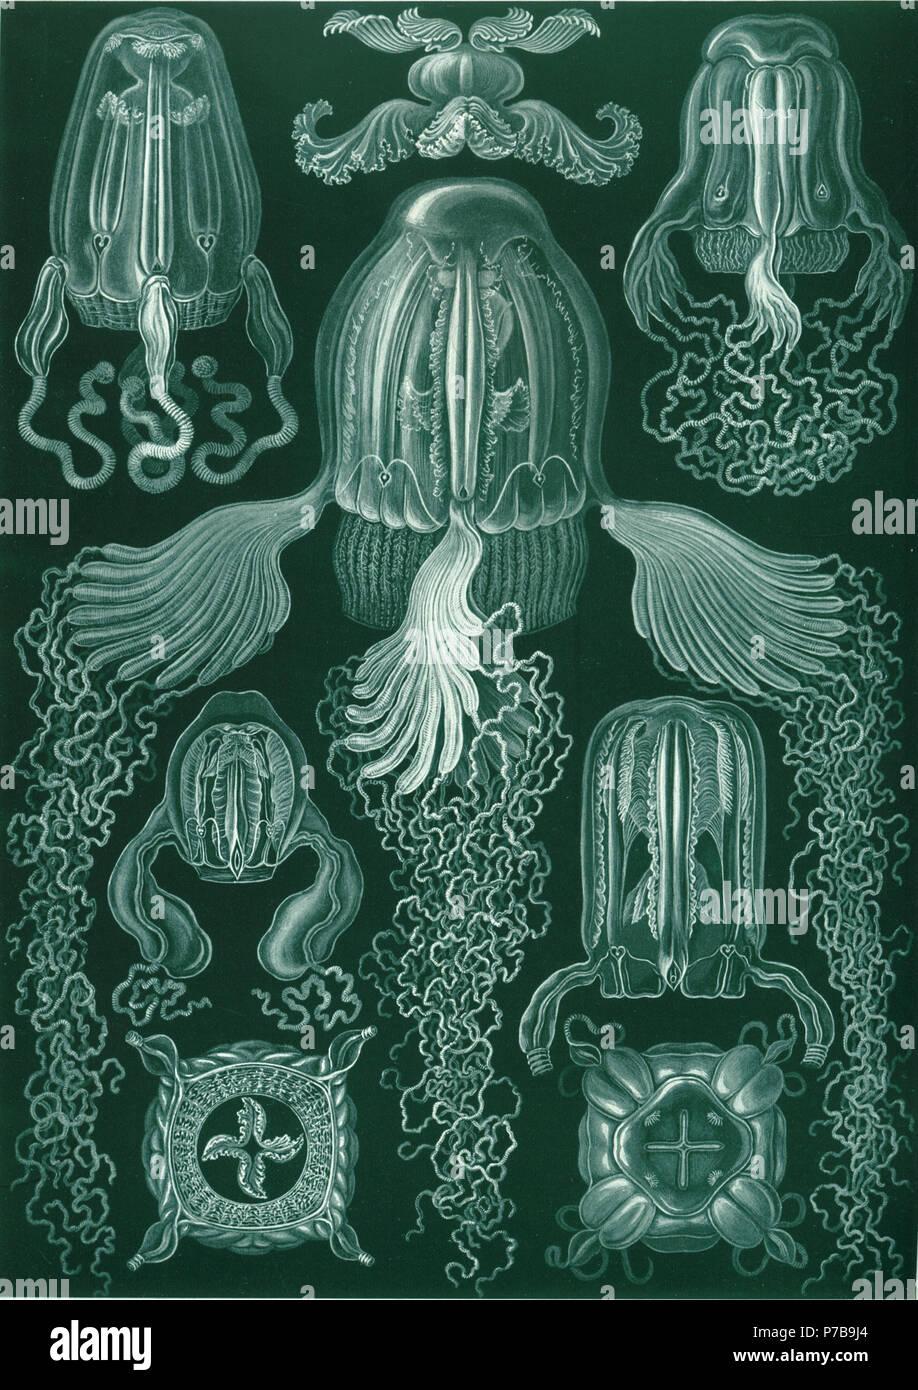 Inglese: Chirodropus palmatus (Haeckel) = Chirodropus palmatus Haeckel, 1880, dal lato Chiropsalmus quadrigatus (Haeckel) = Chiropsoides quadrigatus (Haeckel, 1880), dal lato Charybdea obeliscus (Haeckel) = Carybdea obeliscus Haeckel, 1880 / Alatina obeliscus (Haeckel, 1880), dal lato Charybdea obeliscus (Haeckel) = Carybdea obeliscus Haeckel, 1880 / Alatina obeliscus (Haeckel, 1880), apparato digerente Charybdea murrayana (Haeckel) = Carybdea murrayana Haeckel, 1880, dal basso Charybdea murrayana (Haeckel) = Carybdea murrayana Haeckel, 1880, dal di sopra Procharybdis tetraptera ( Immagini Stock